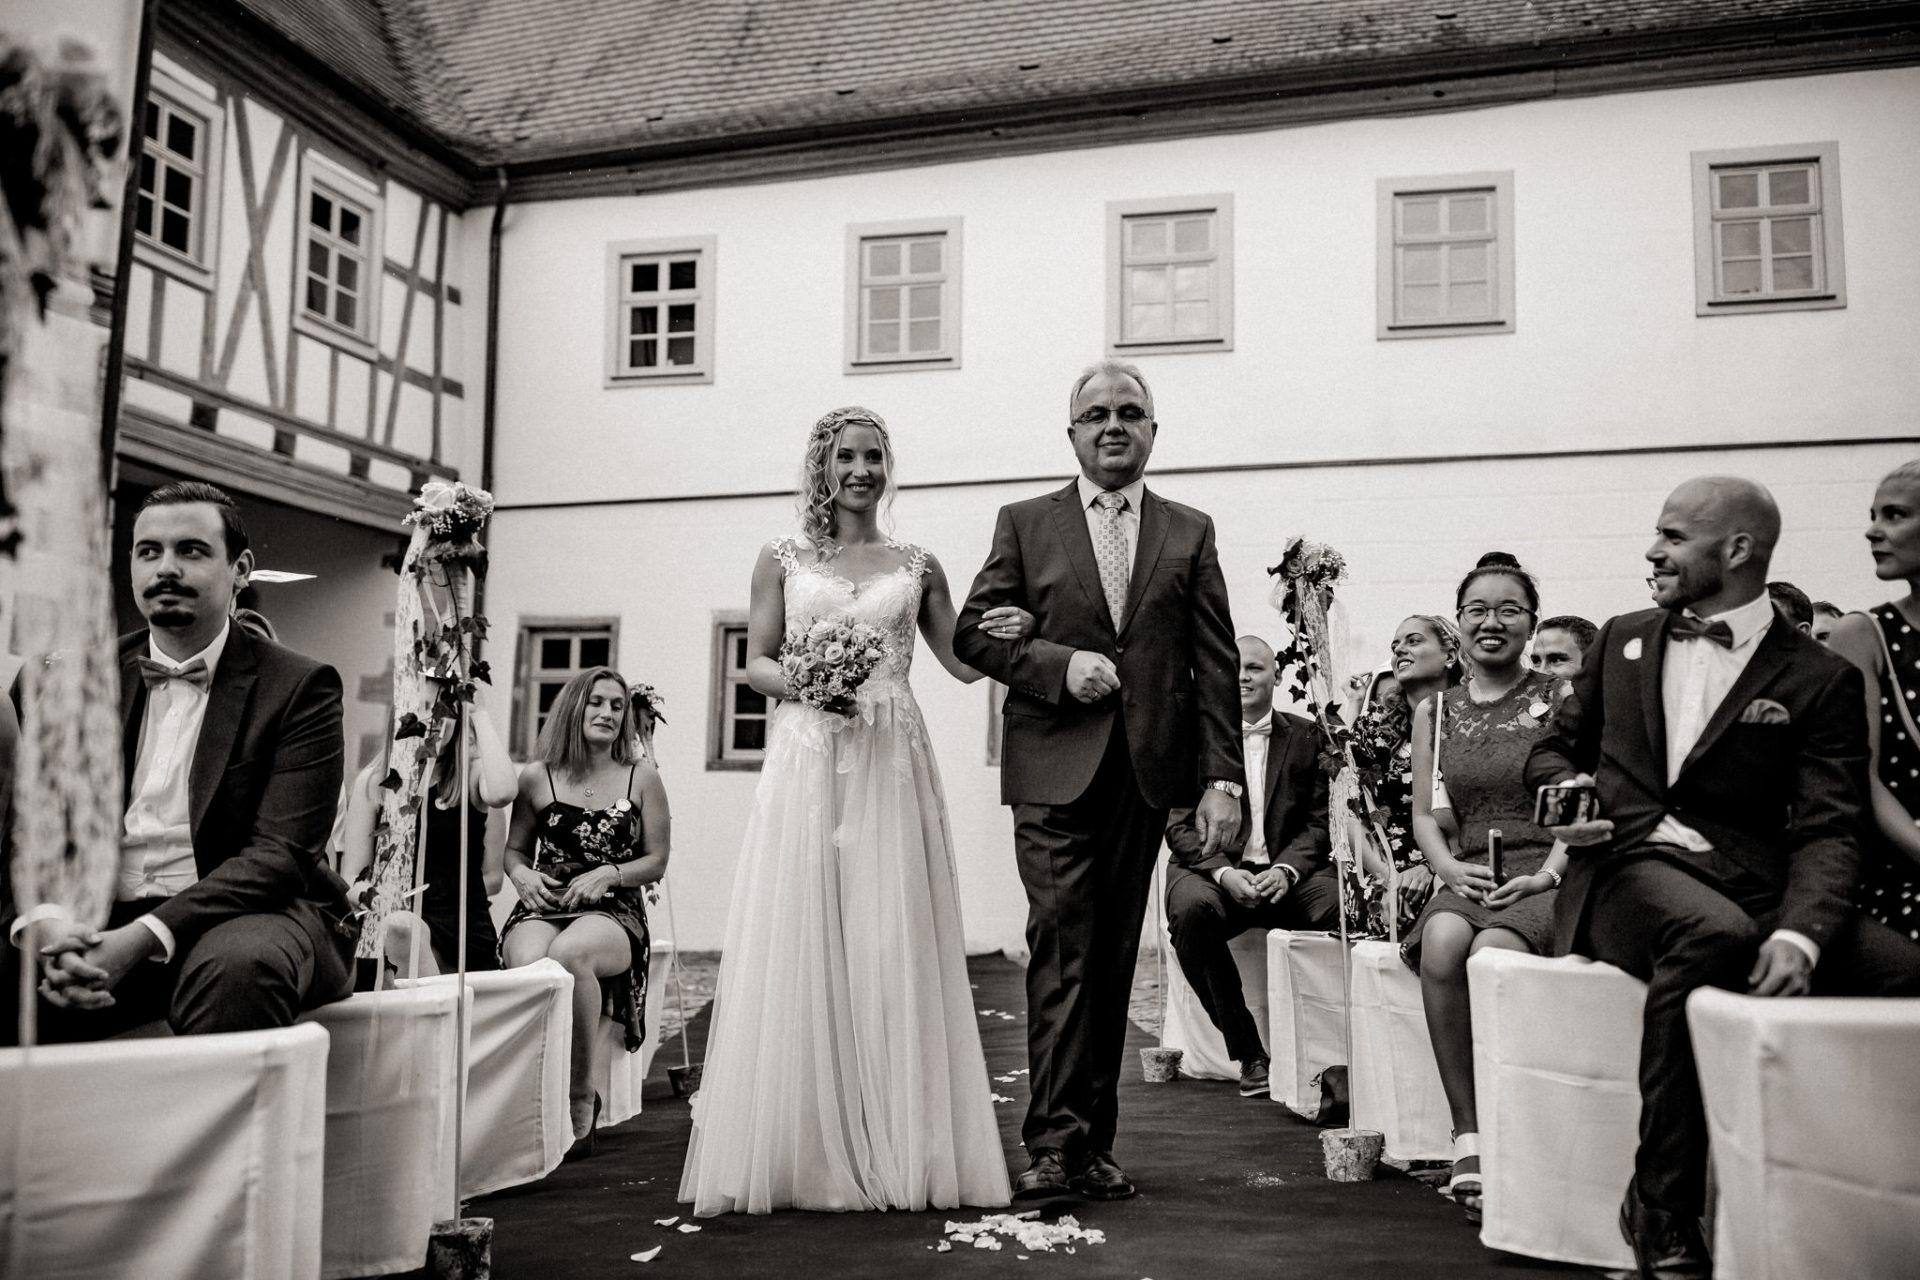 wedding photographer suttgart-reception water castle Erkenbrechtshausen Crailsheim-wedding ceremony outdoor summer rain